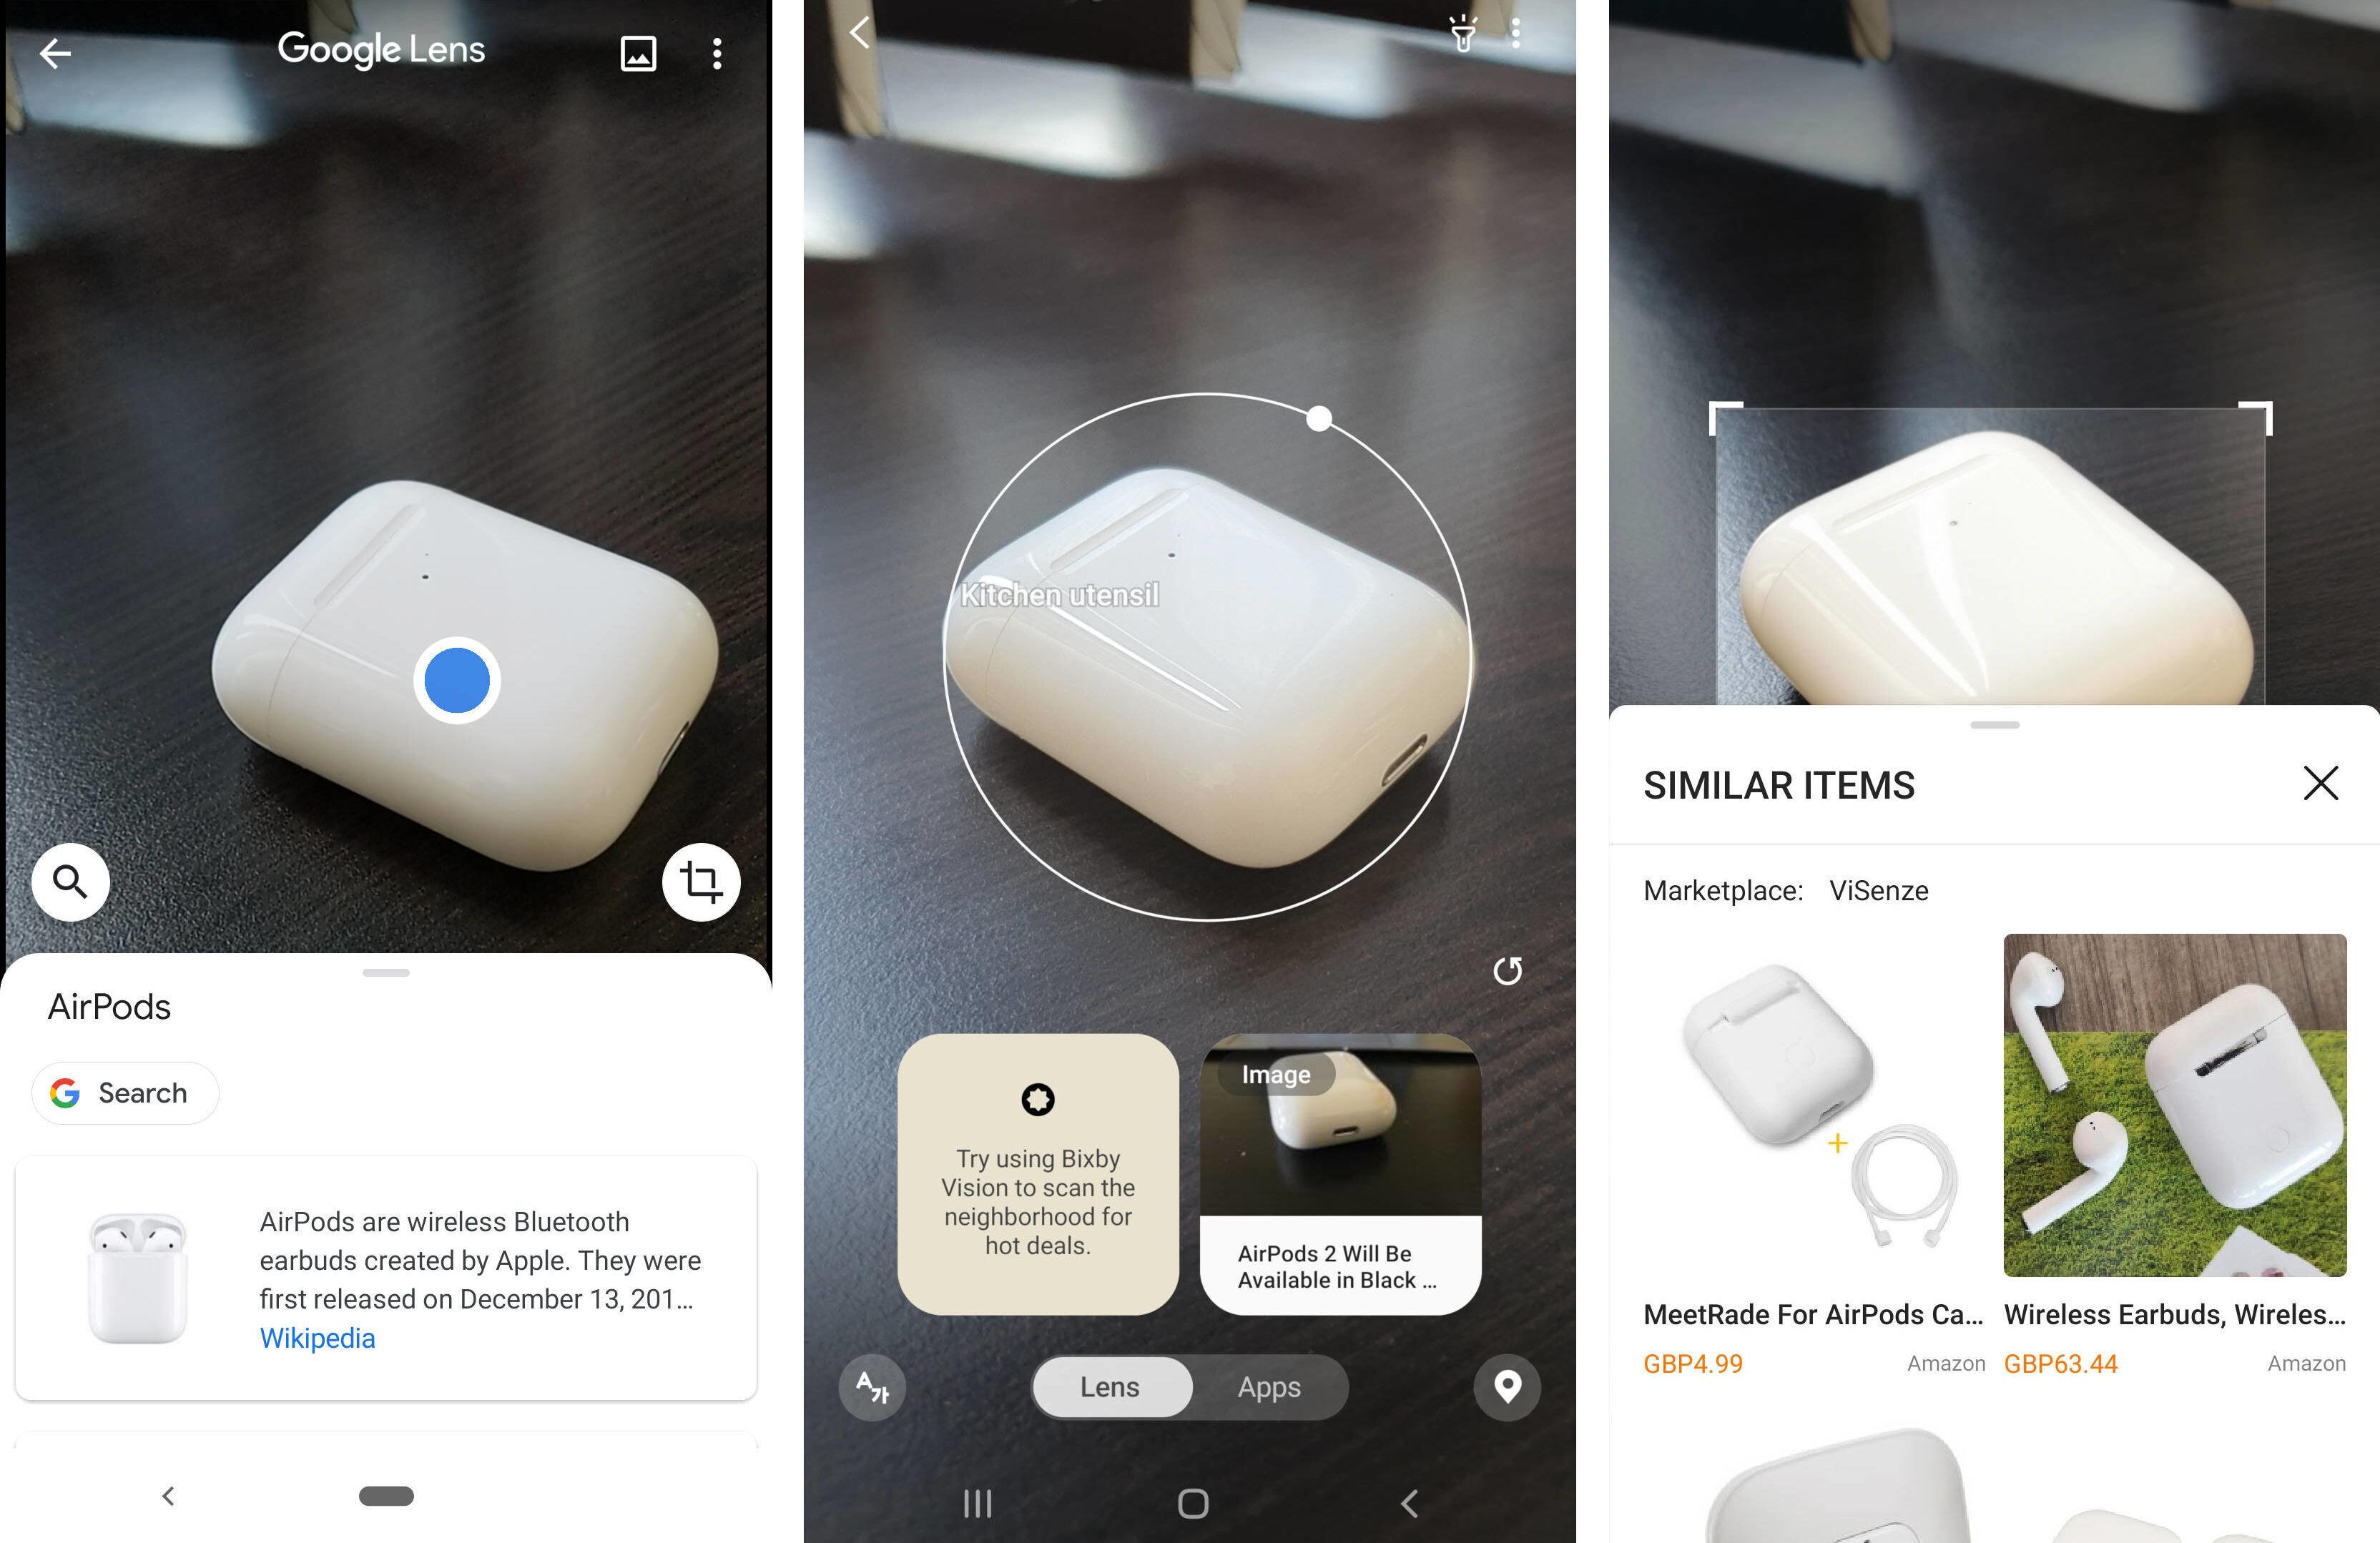 Artificial intelligence showdown: Google Lens vs Bixby